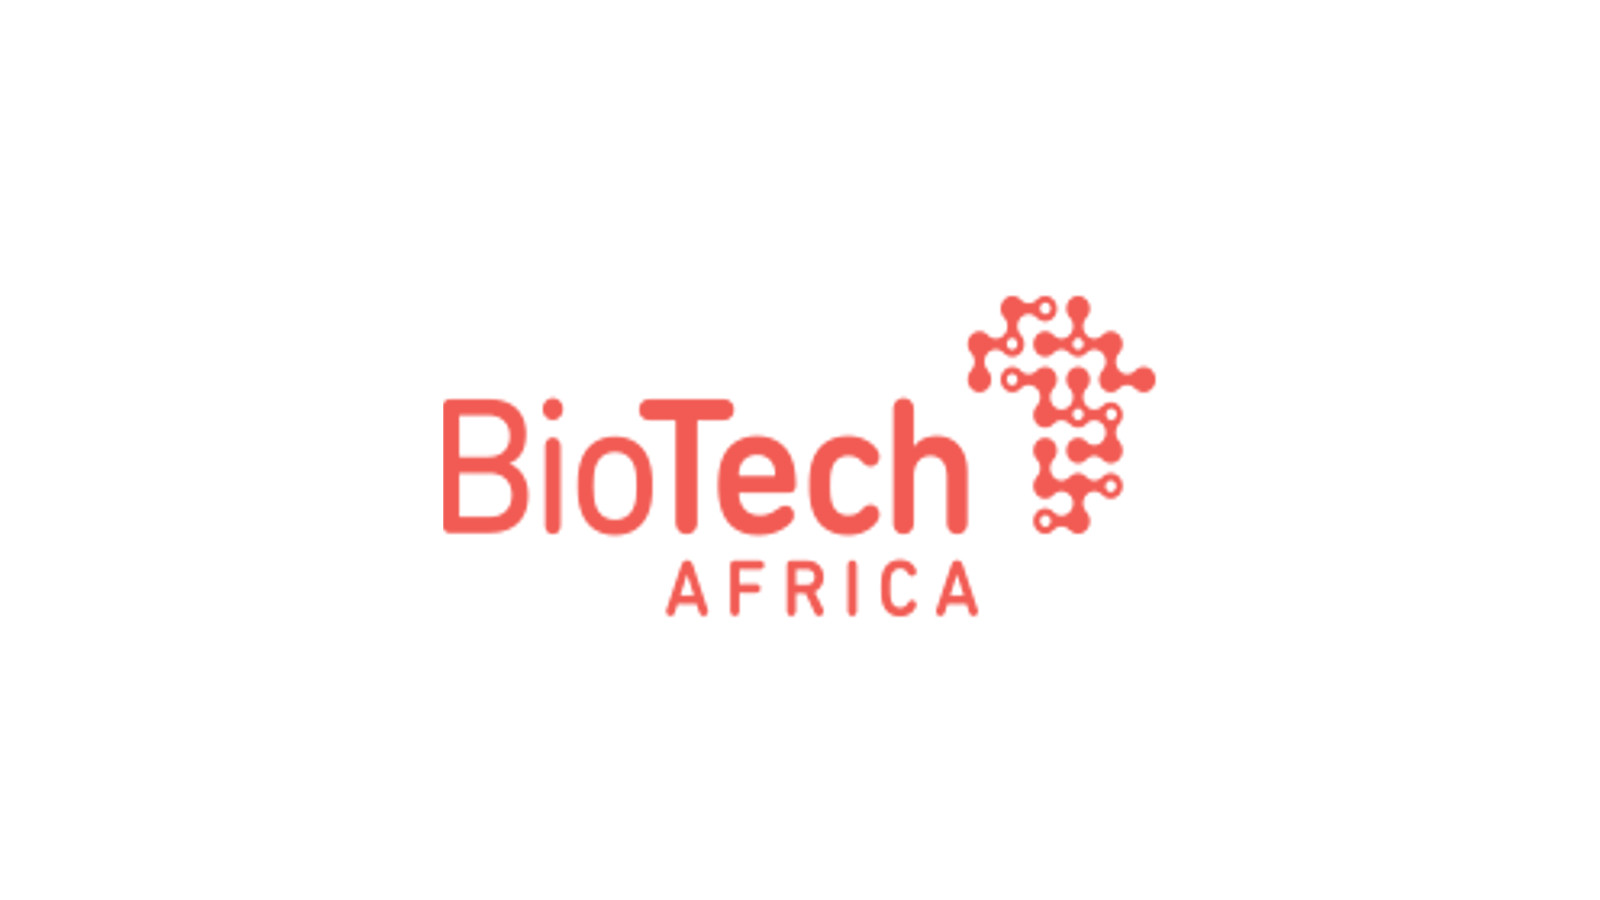 biotech-africad